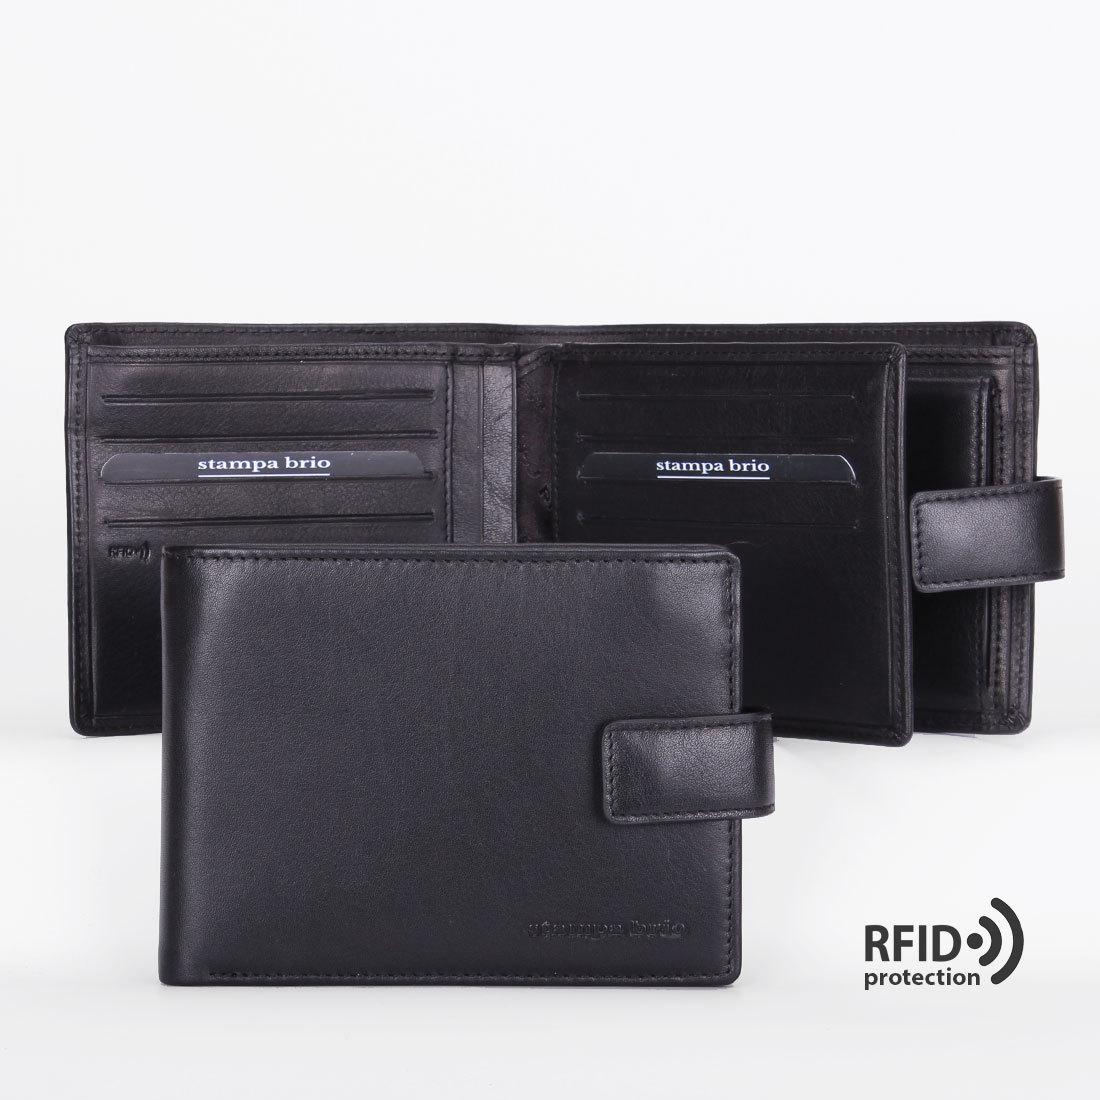 626 R - Портмоне с отделением на молнии и RFID защитой